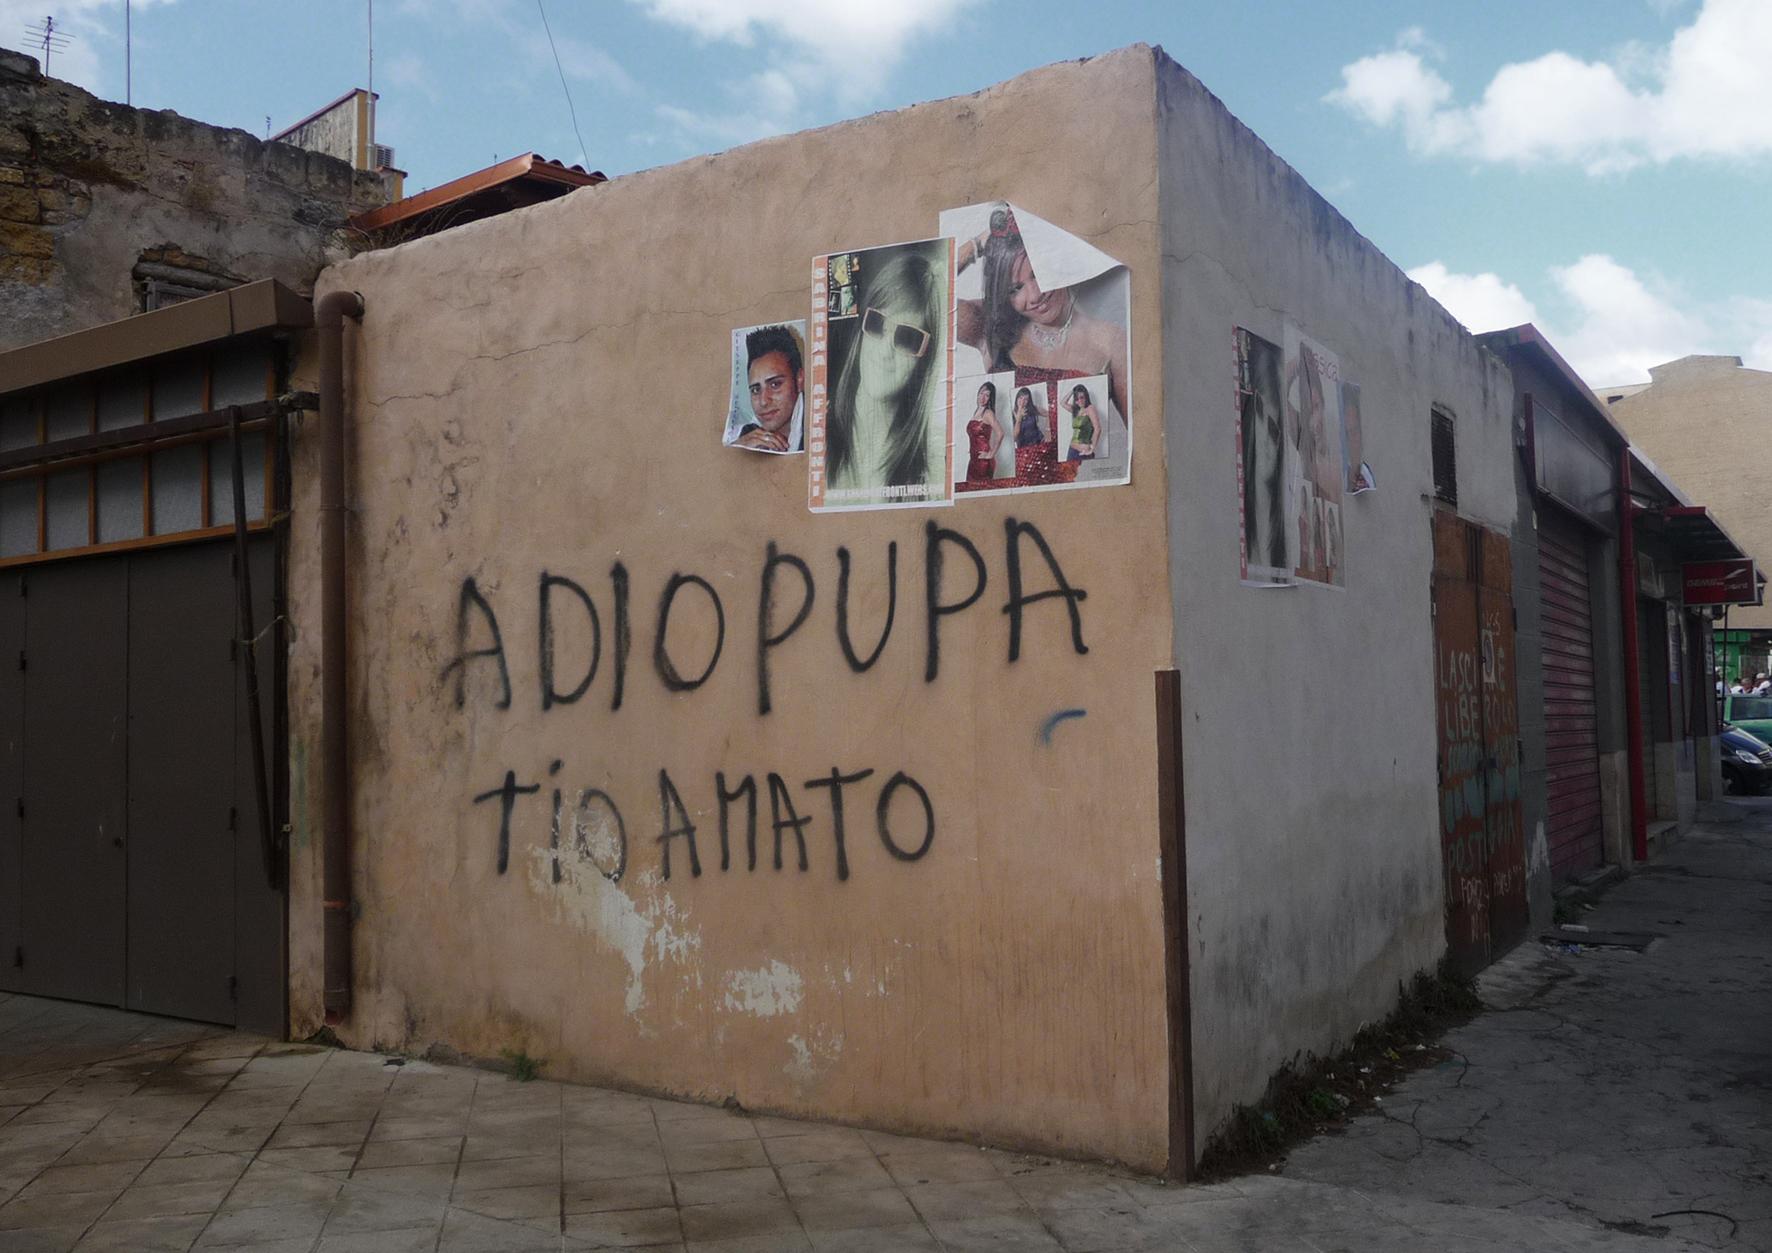 Stefania Galegati Shines, Adio Pupa, 2011, print on paper, 30 x 40 cm